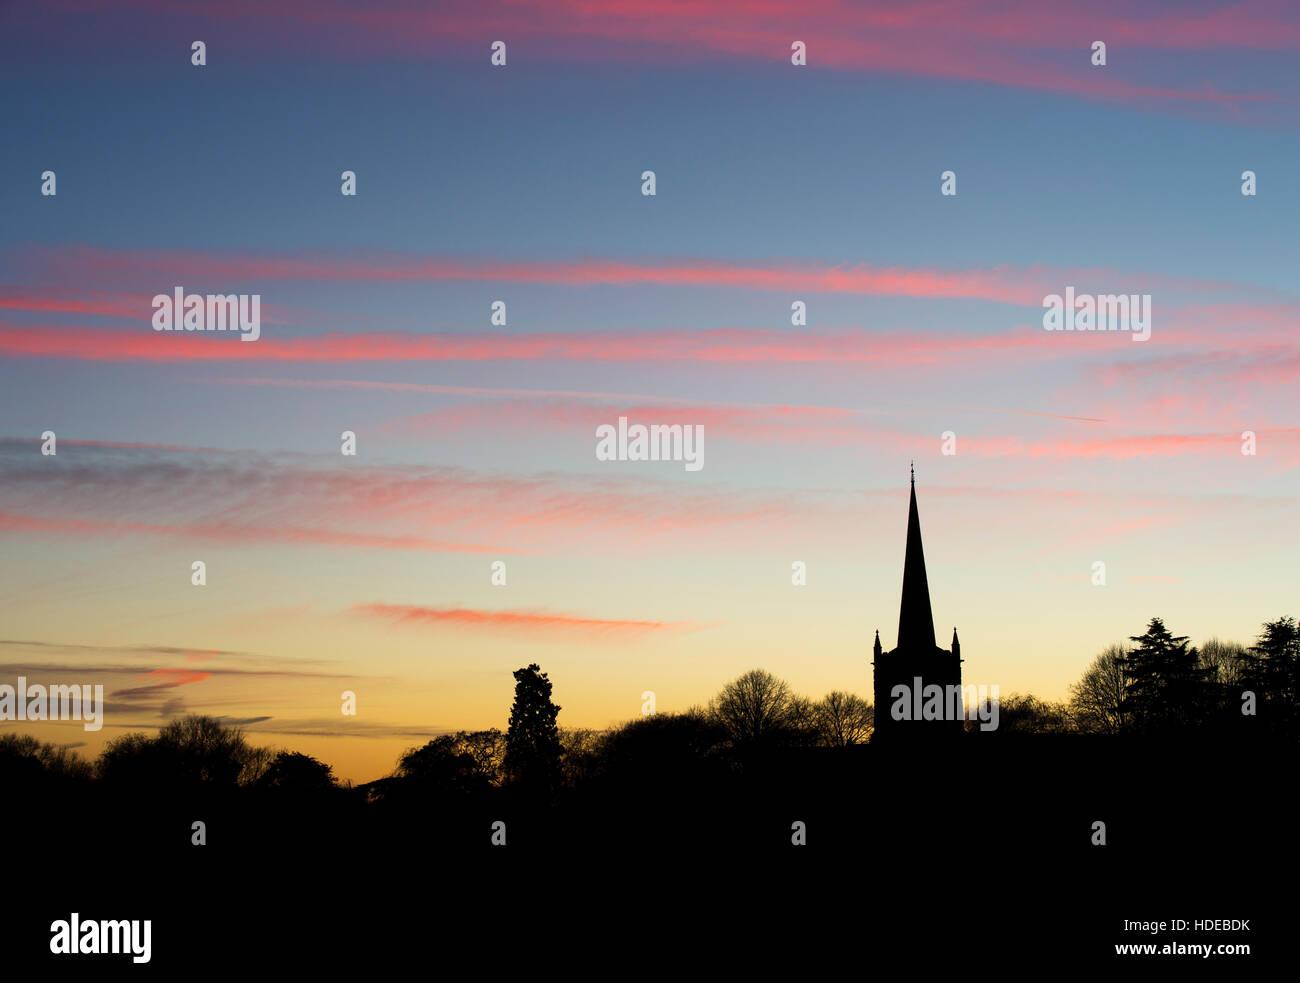 L'église Holy Trinity au coucher du soleil. Stratford Upon Avon, Warwickshire, en Angleterre. Silhouette Photo Stock